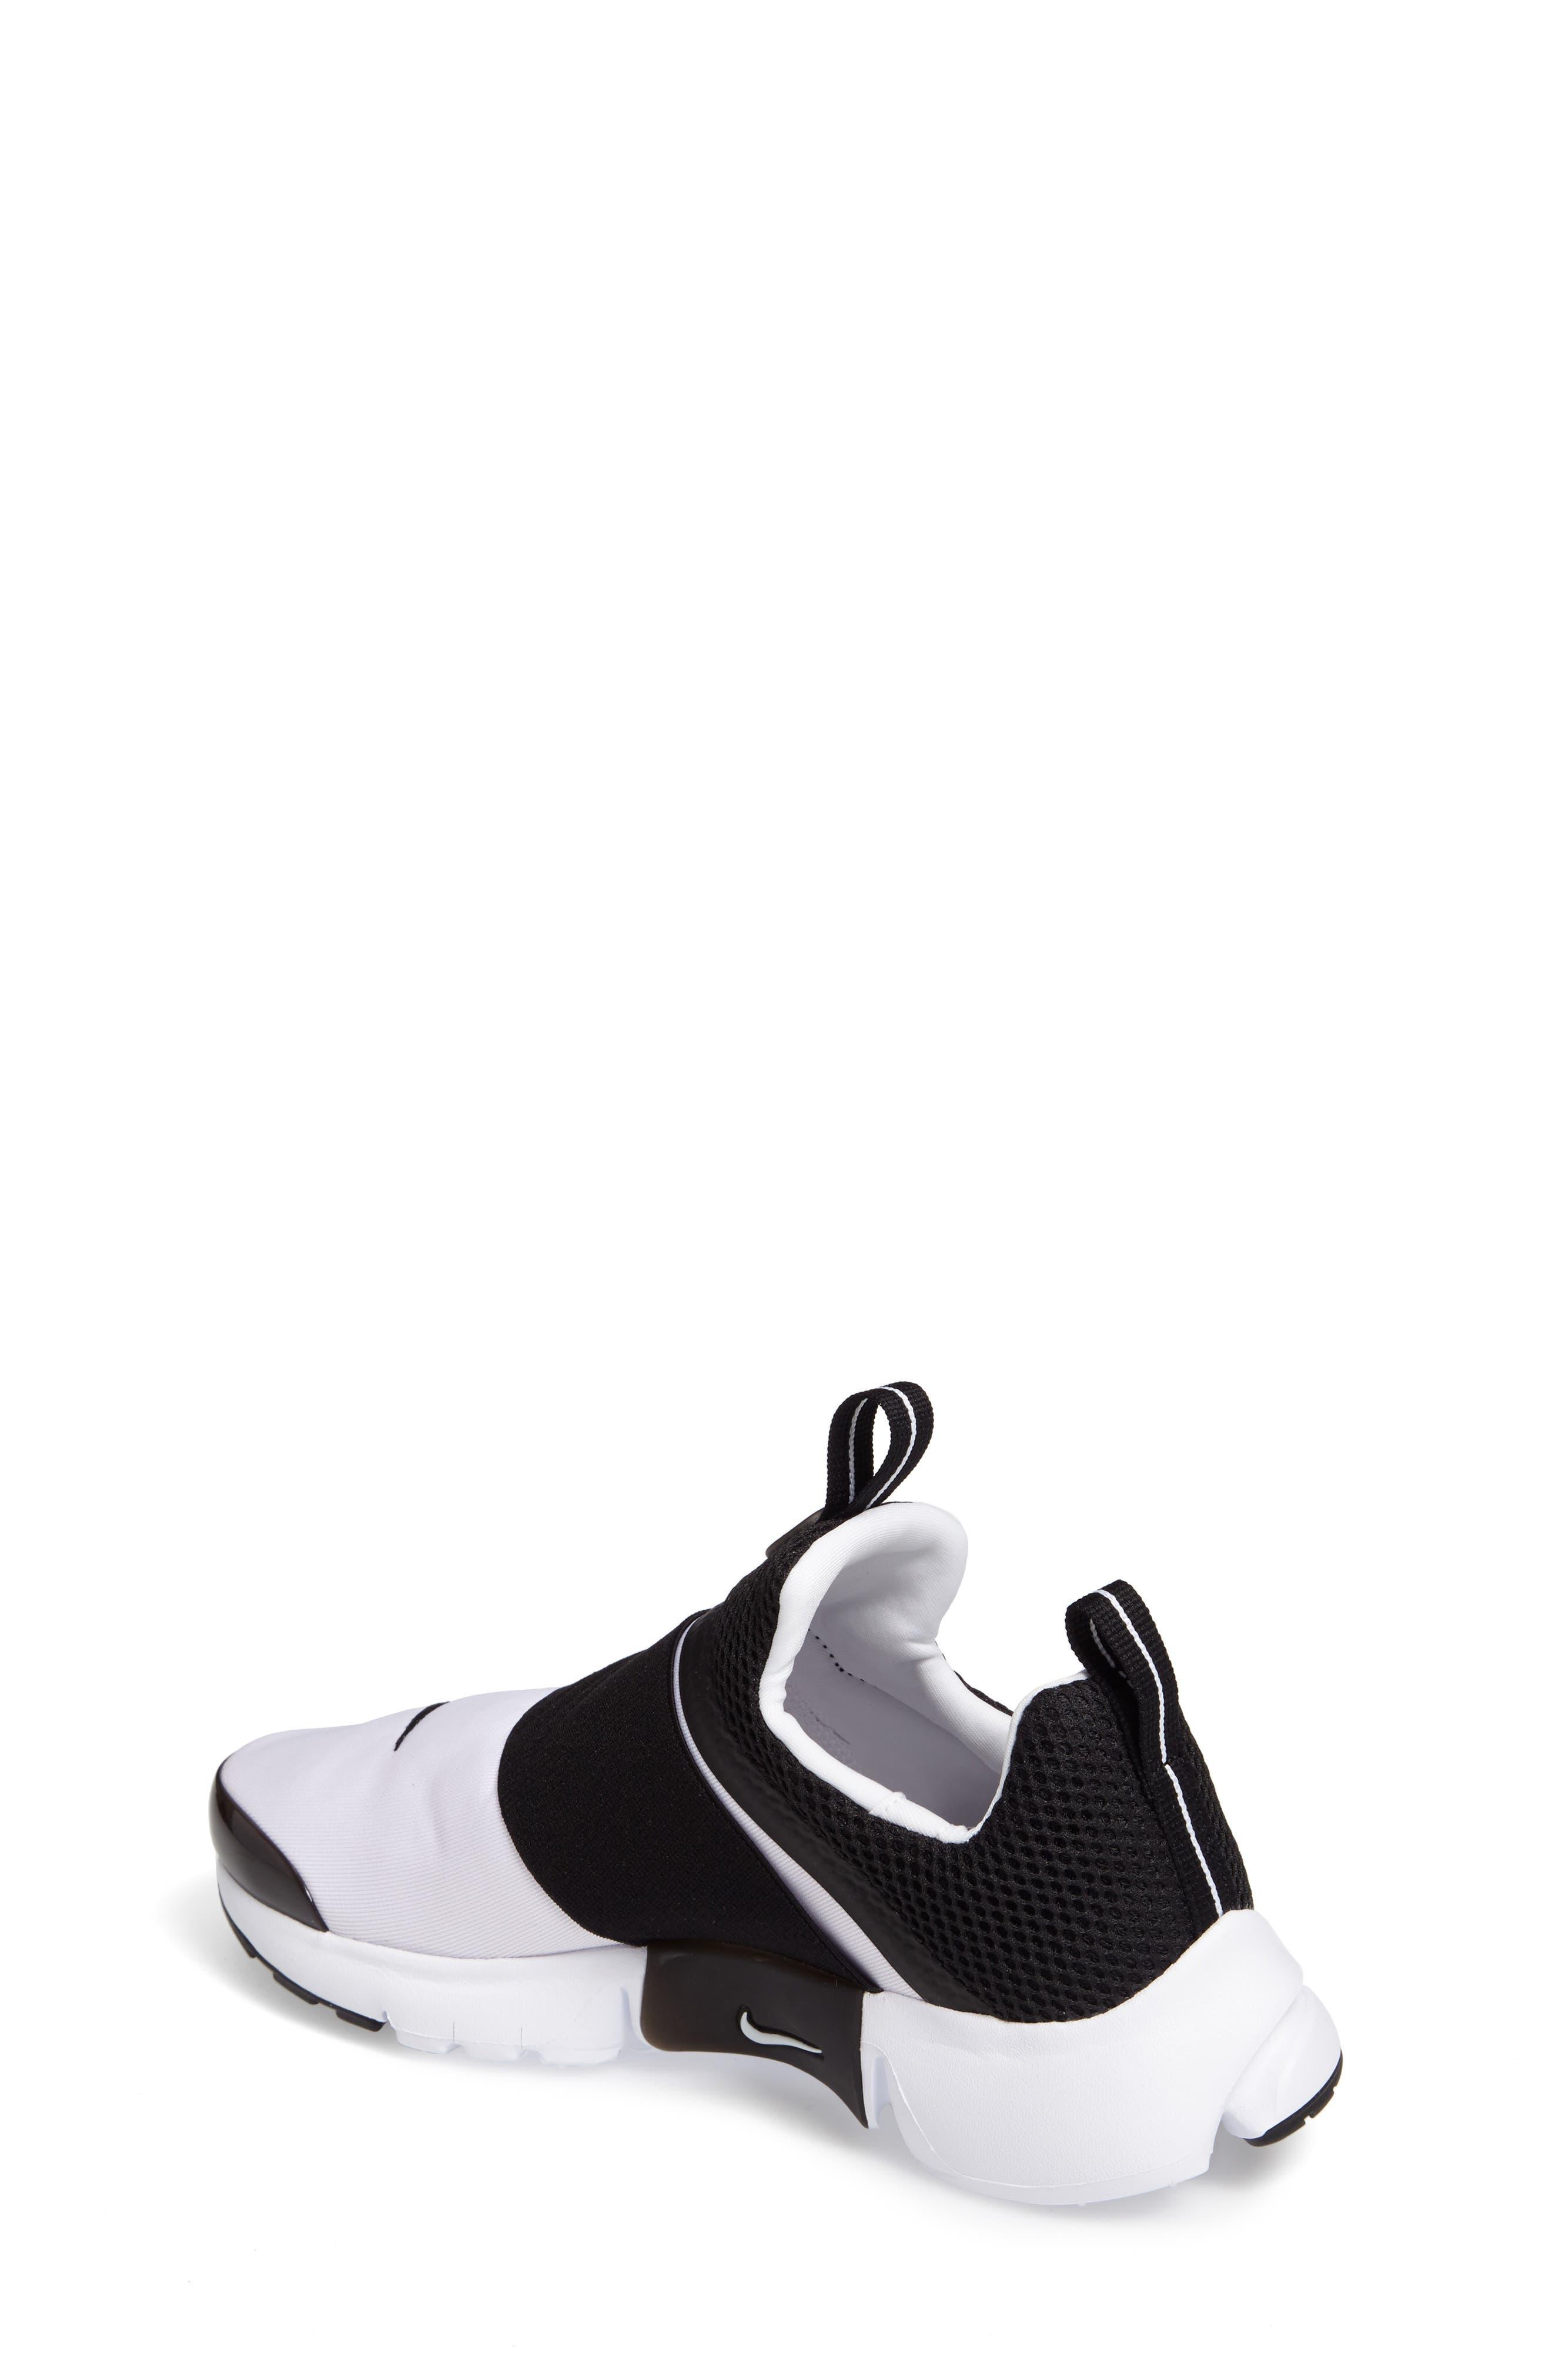 Alternate Image 2  - Nike Presto Extreme Sneaker (Walker, Toddler, Little Kid & Big Kid)